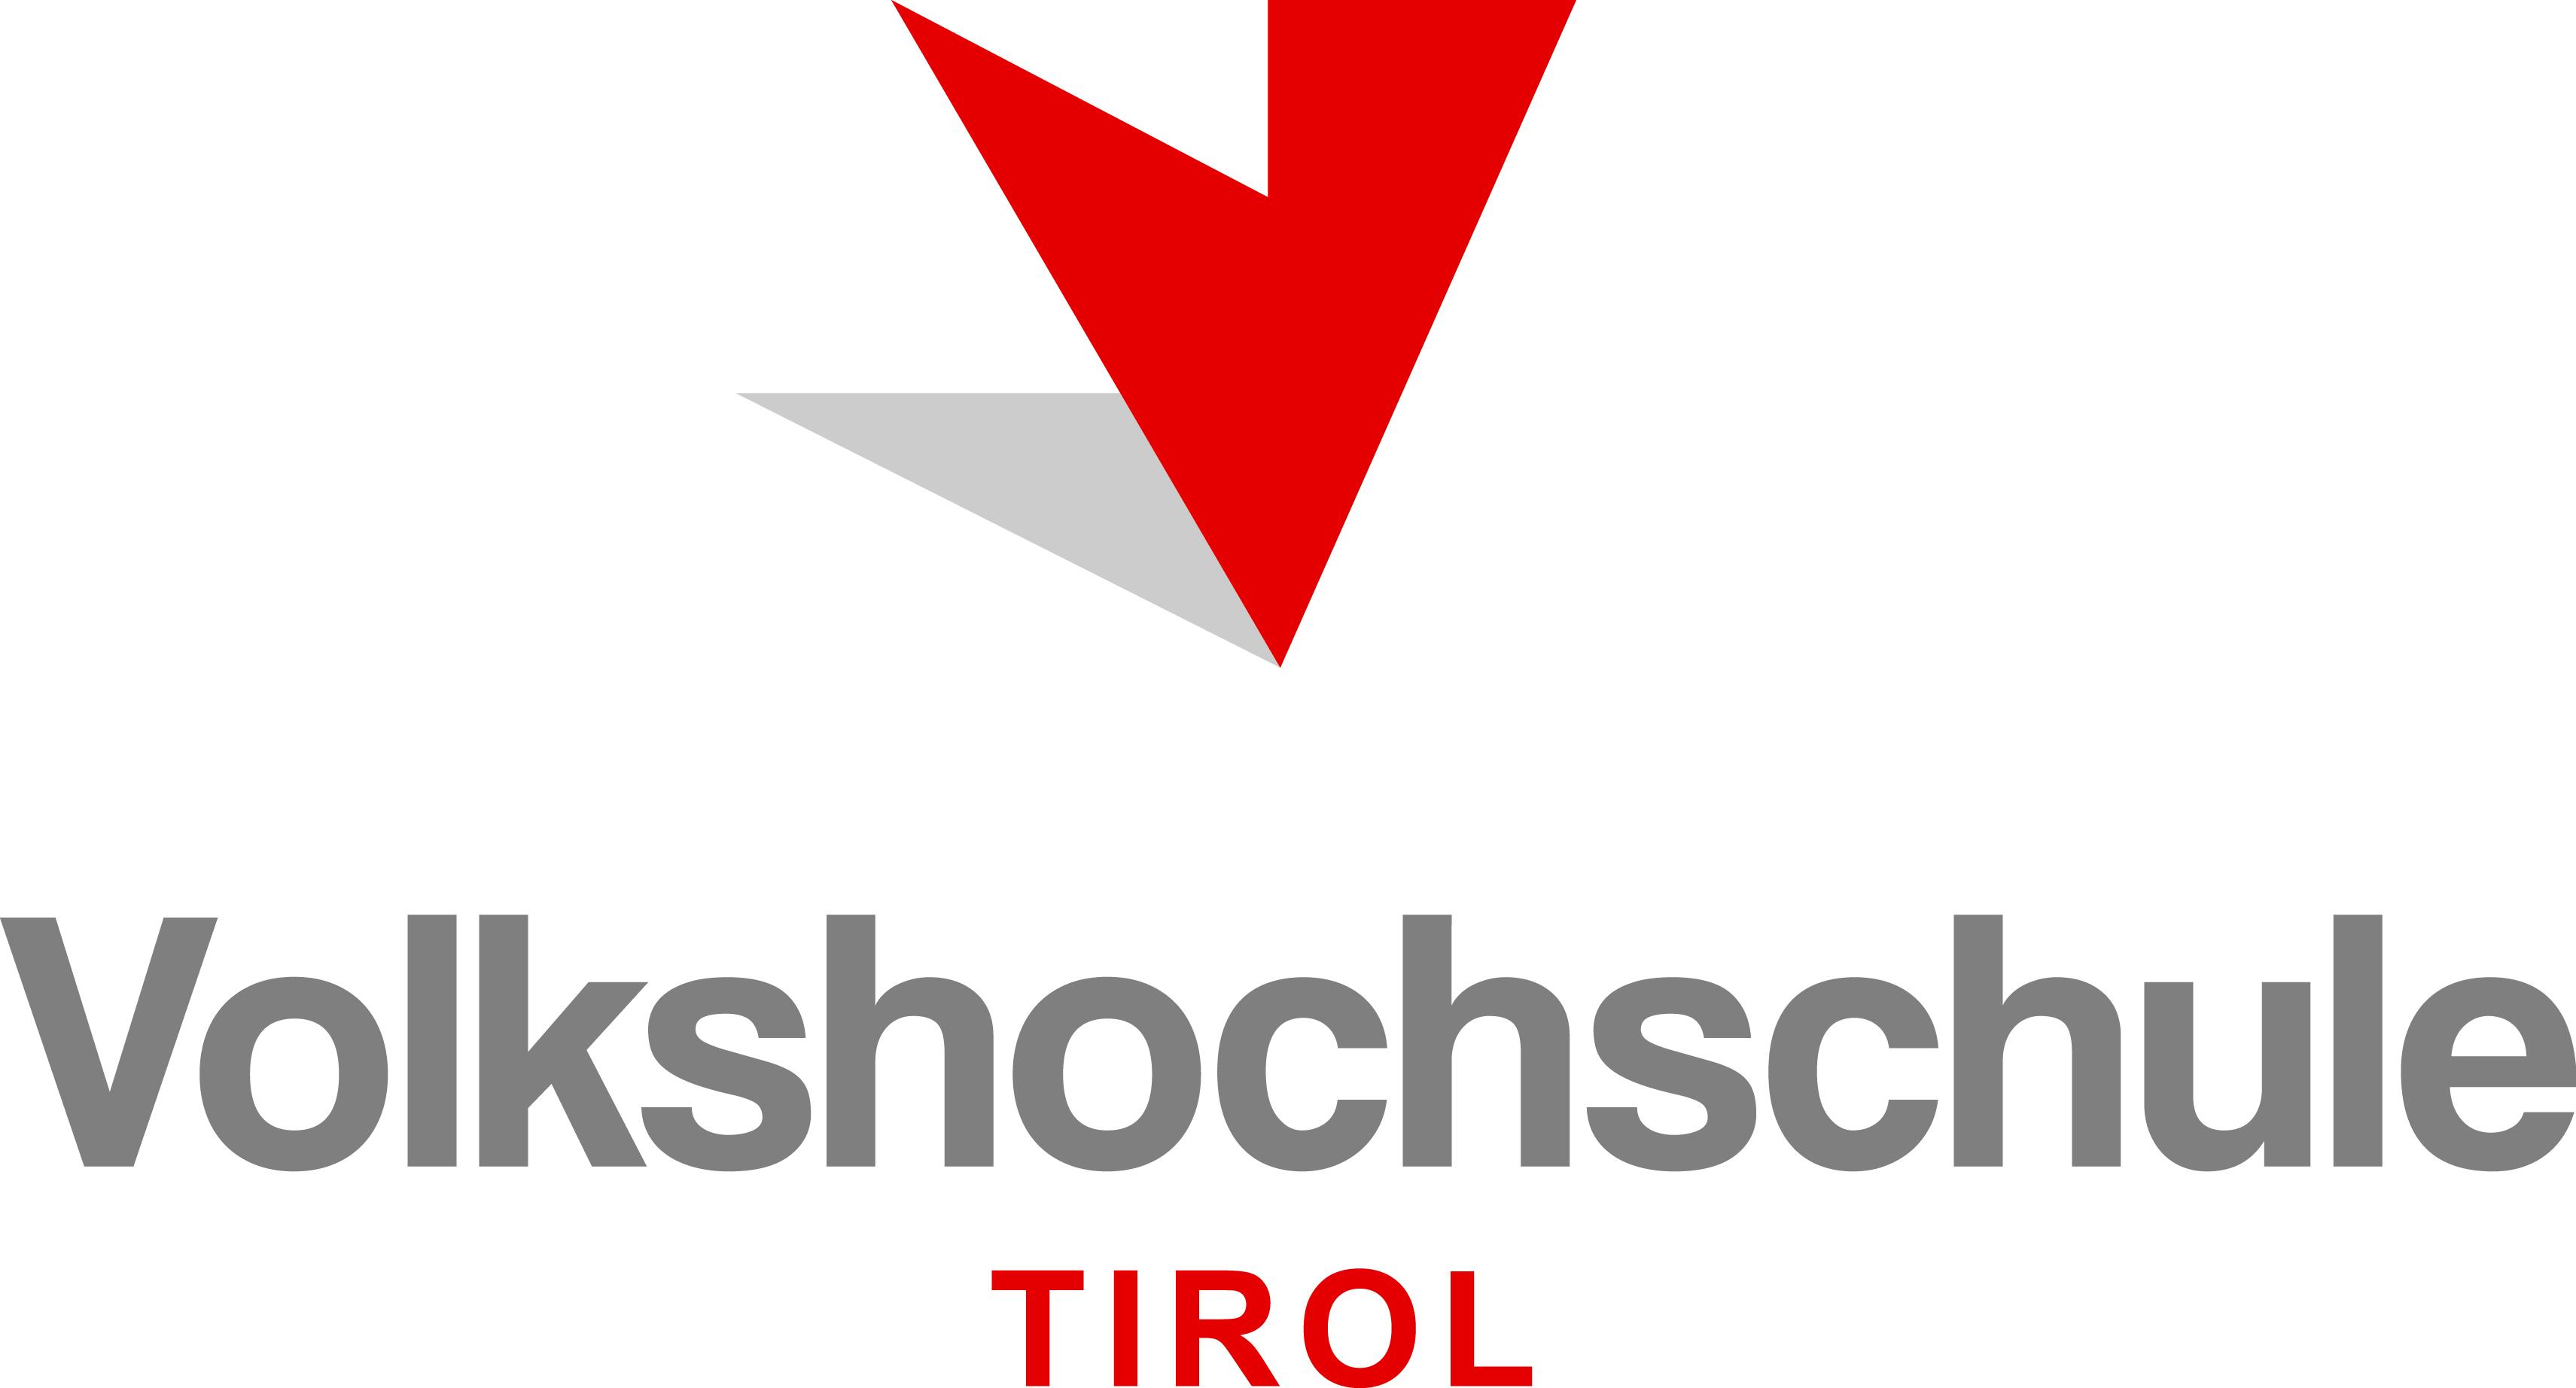 Volkshochschule Tirol logo